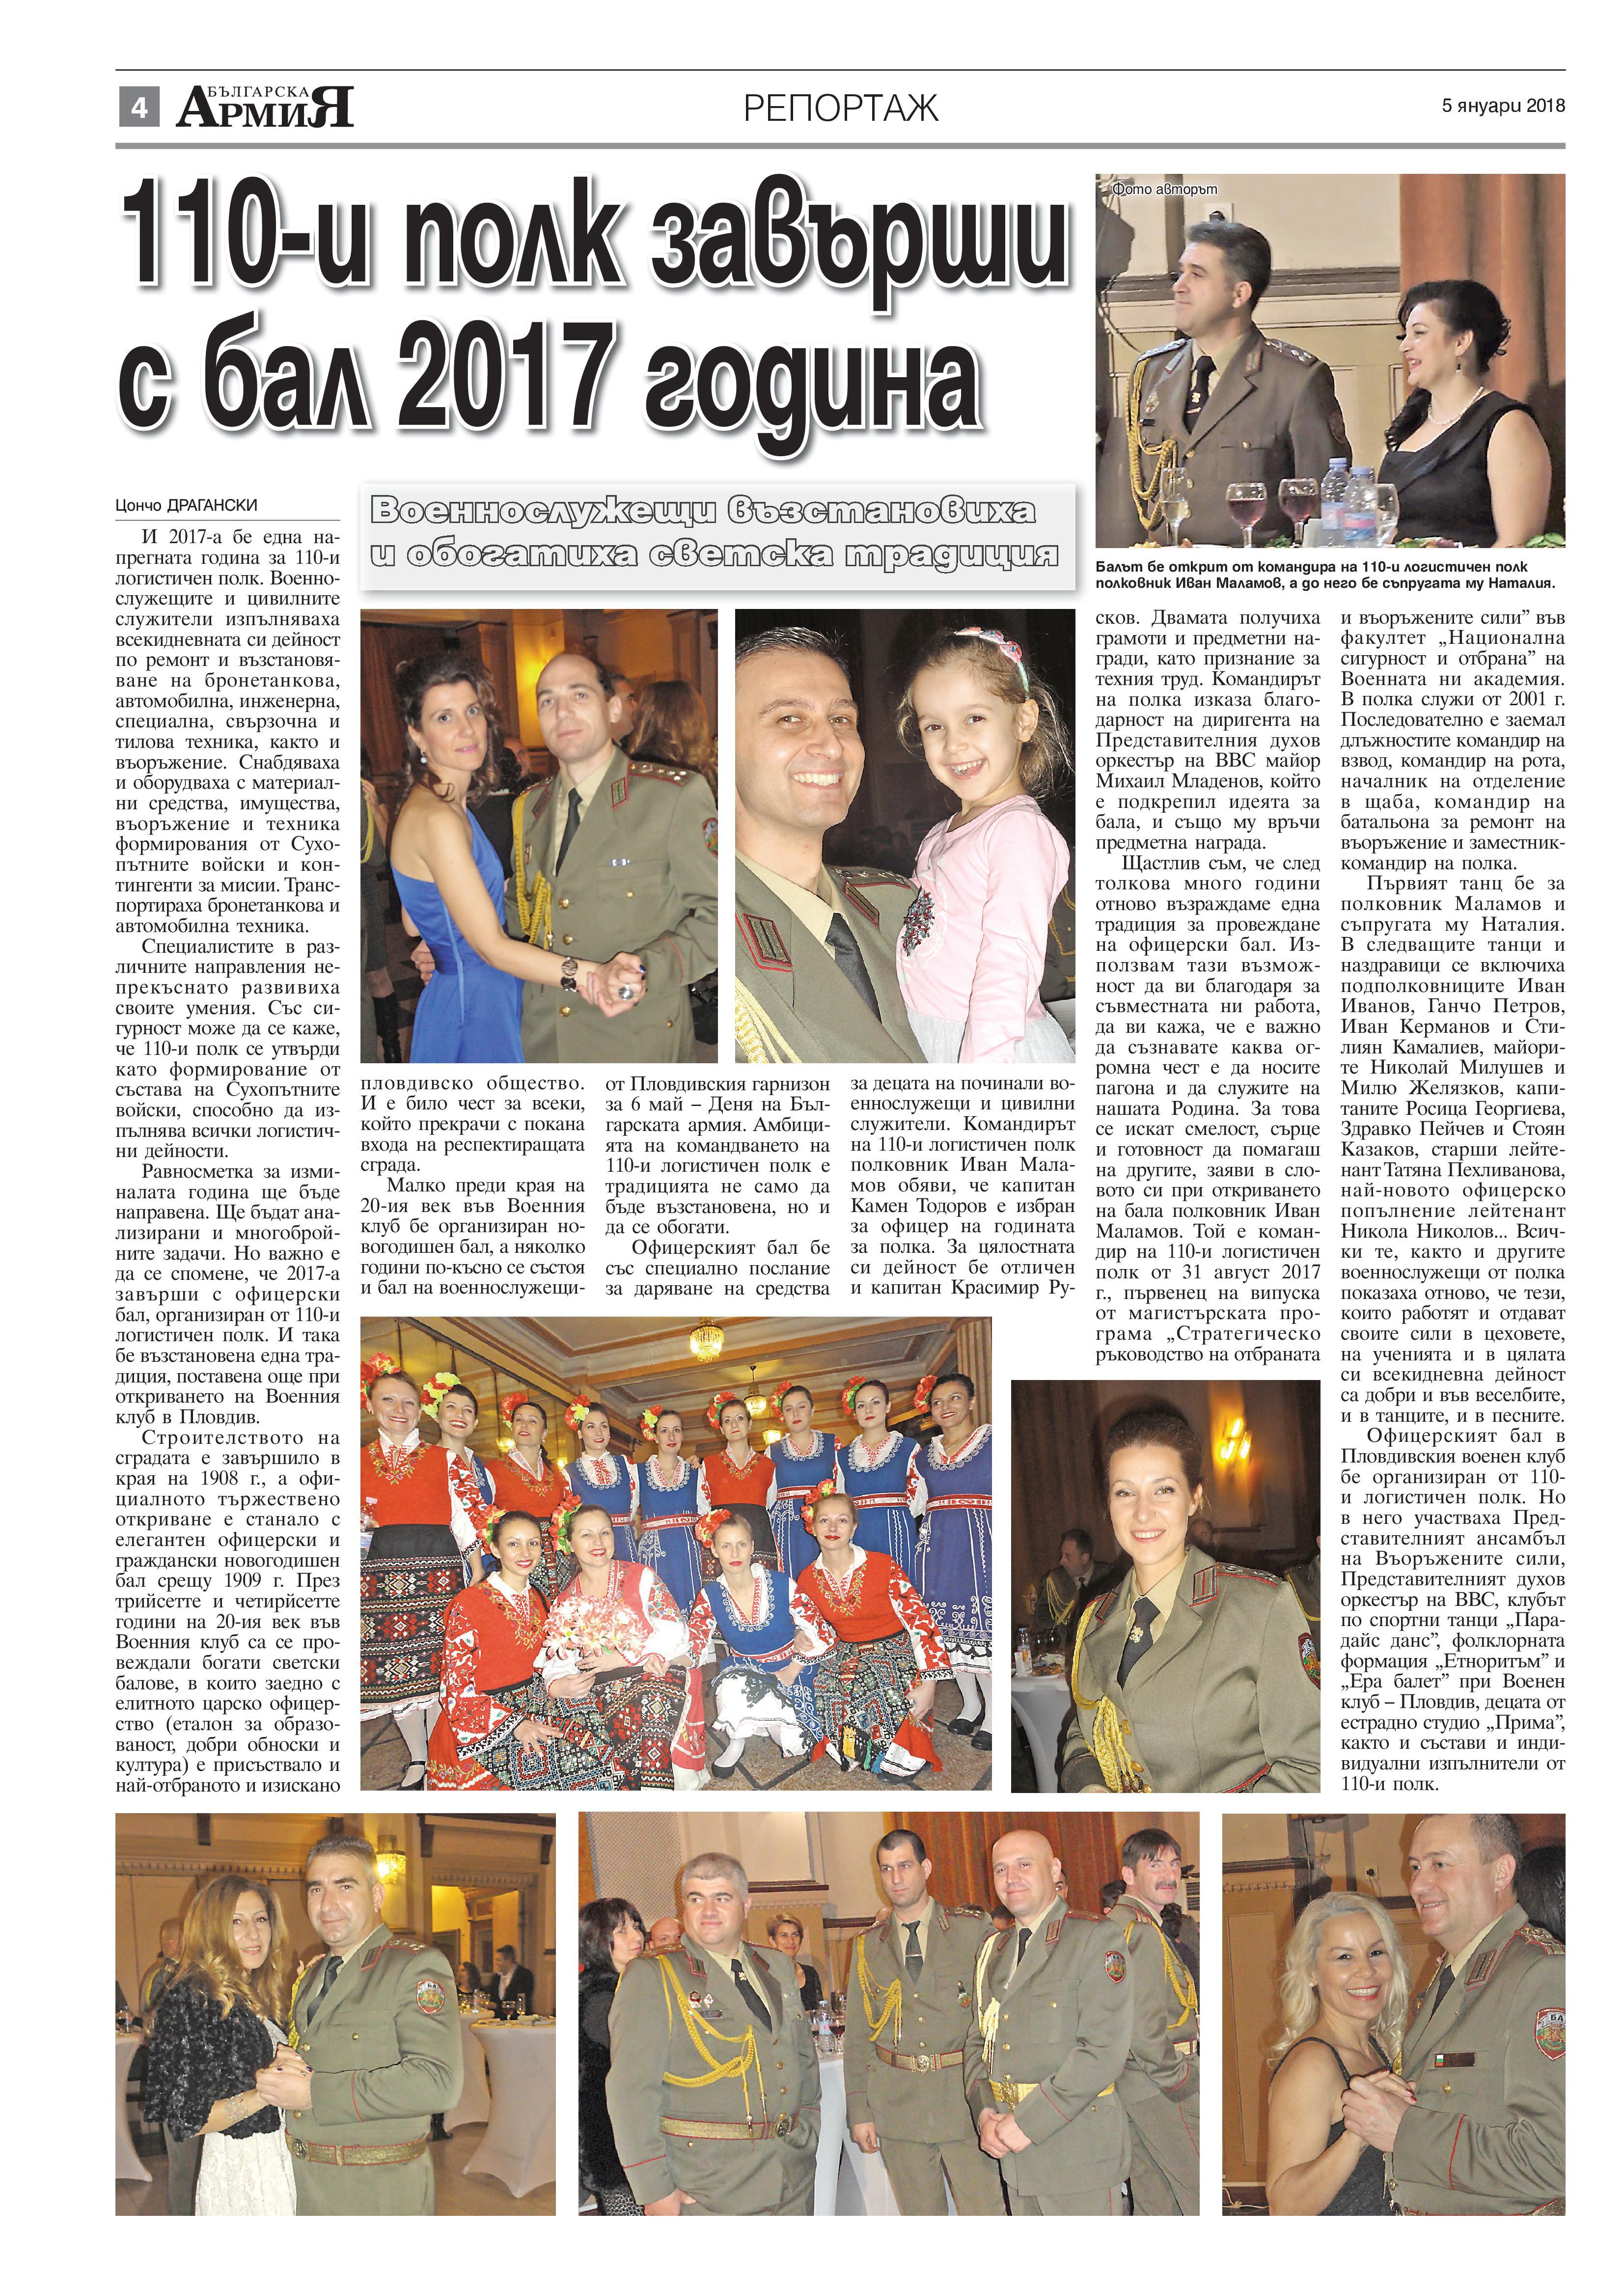 http://armymedia.bg/wp-content/uploads/2018/01/04.jpg